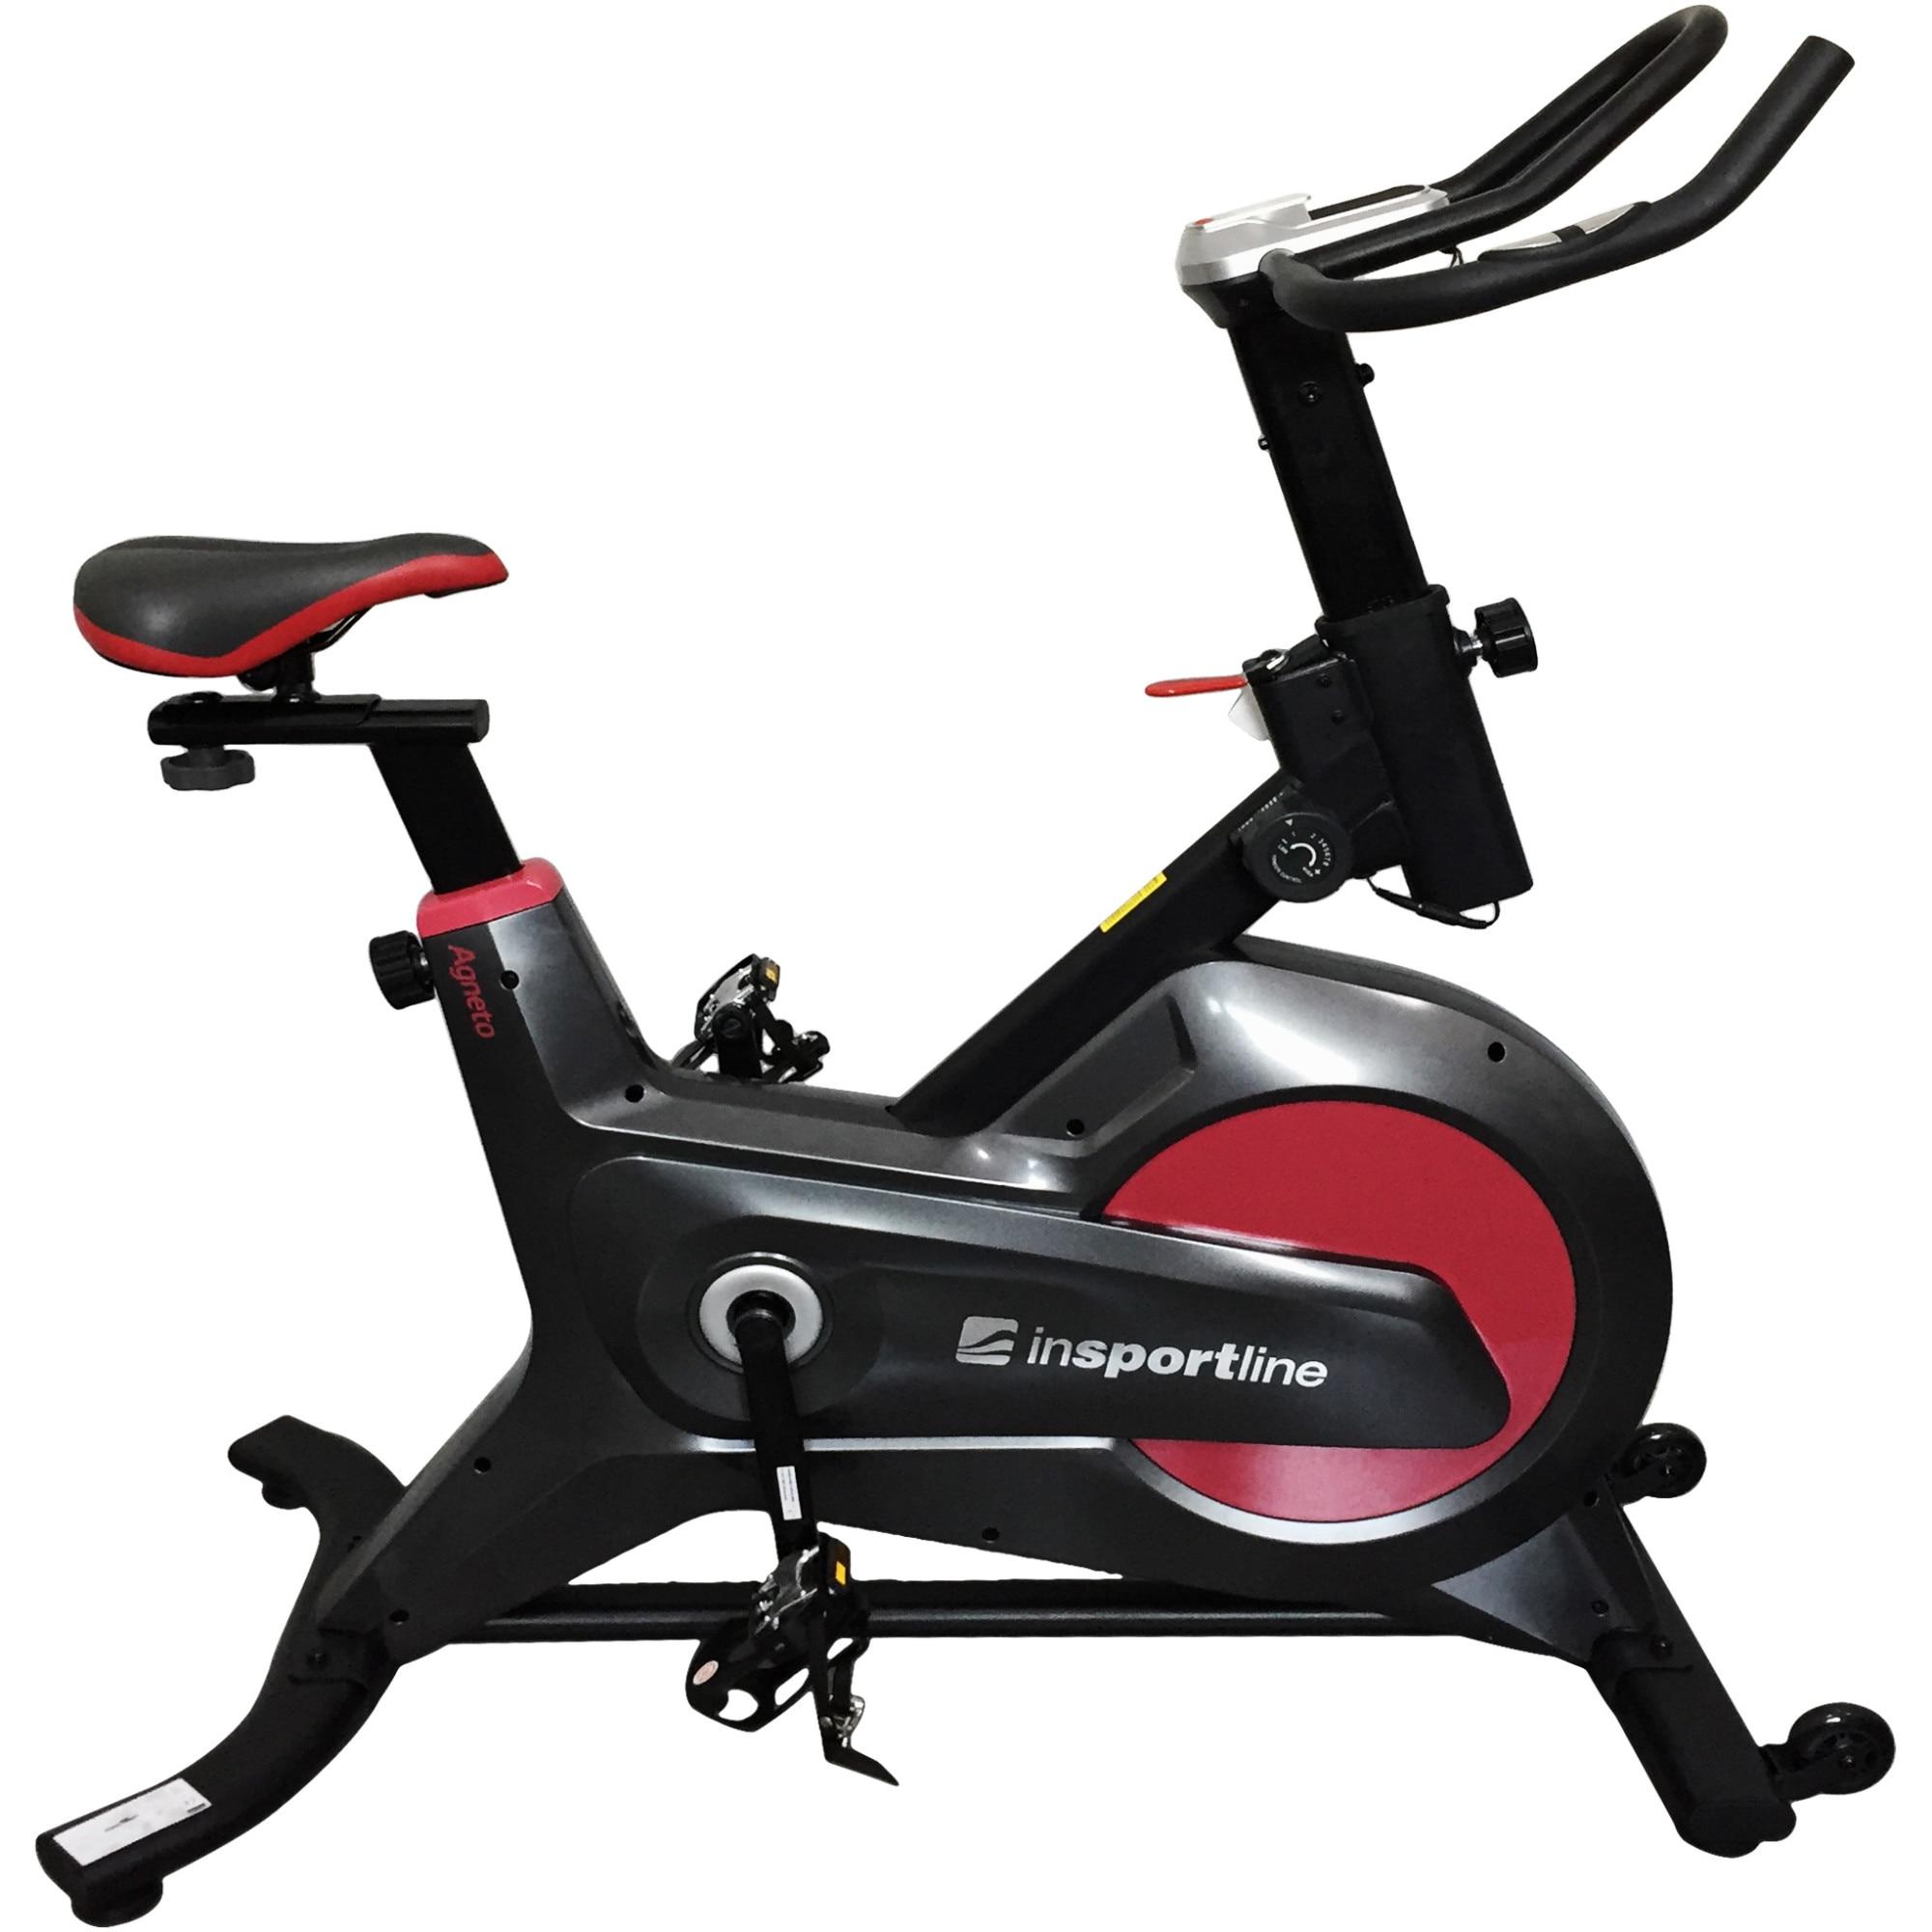 Fotografie Bicicleta spinning magnetica InSPORTline Agneto, greutate volant 6kg, greutate maxima utilizator 120kg